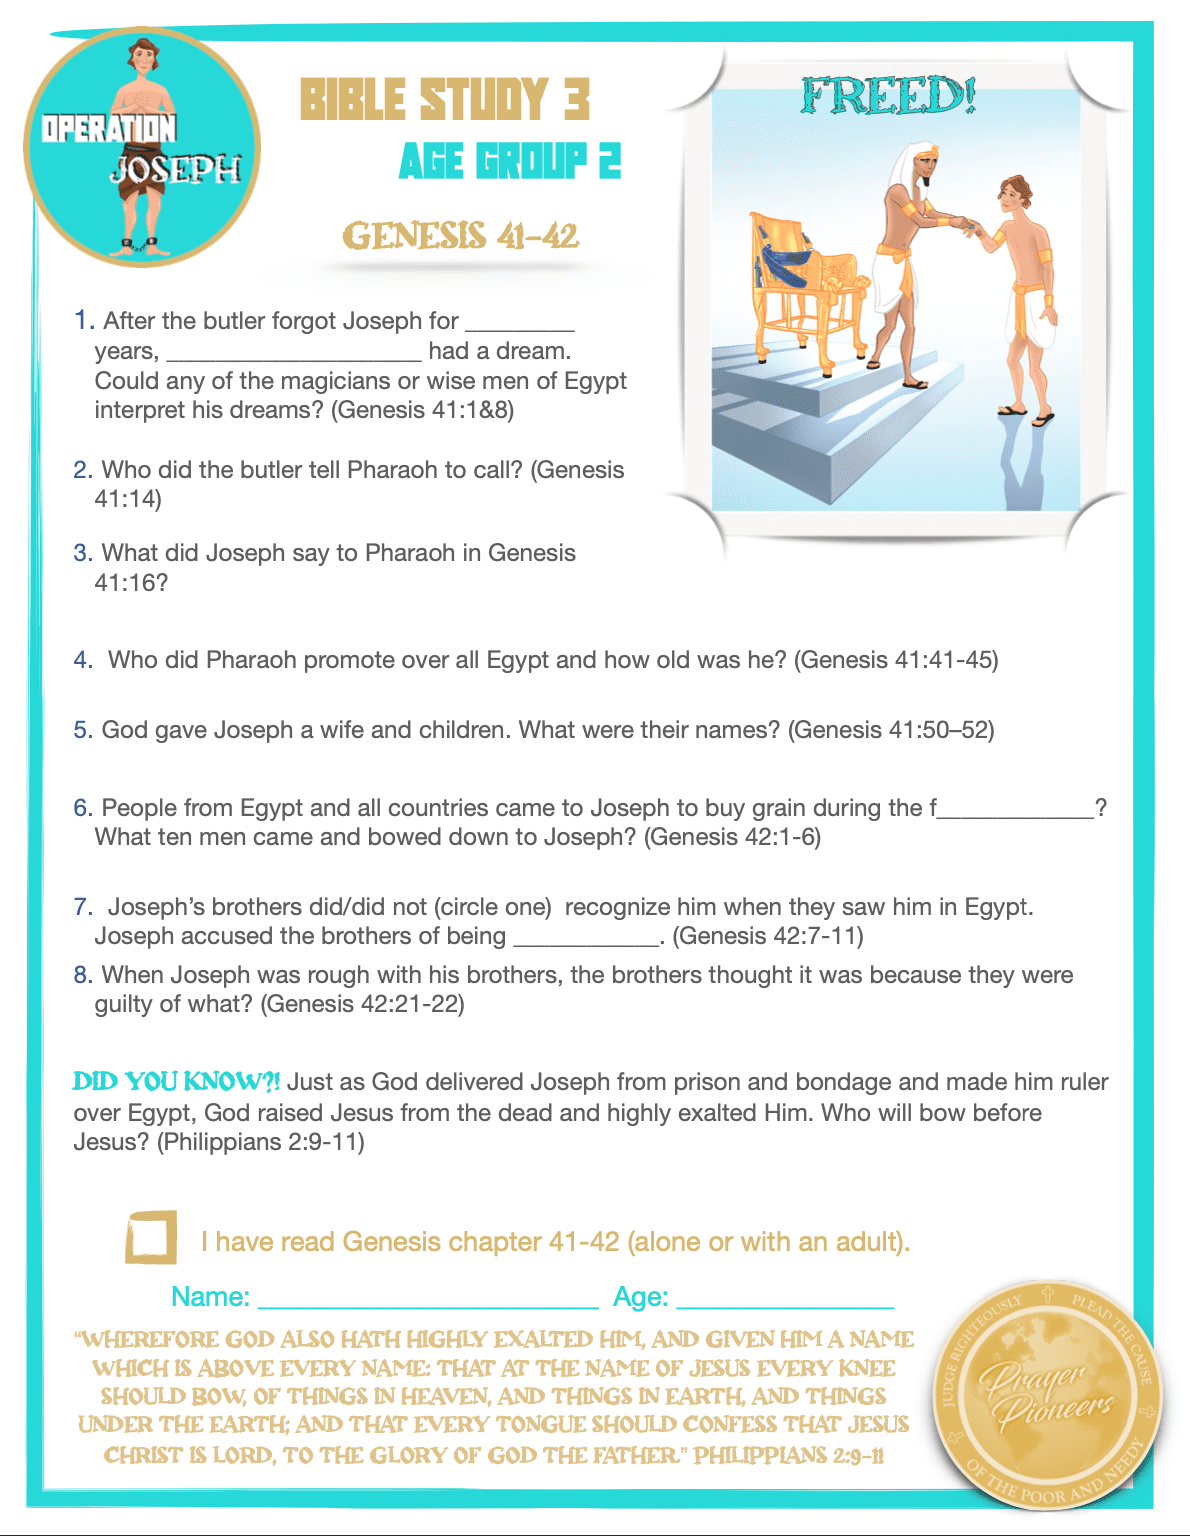 OJ - Bible Study 3 - Age Group 2